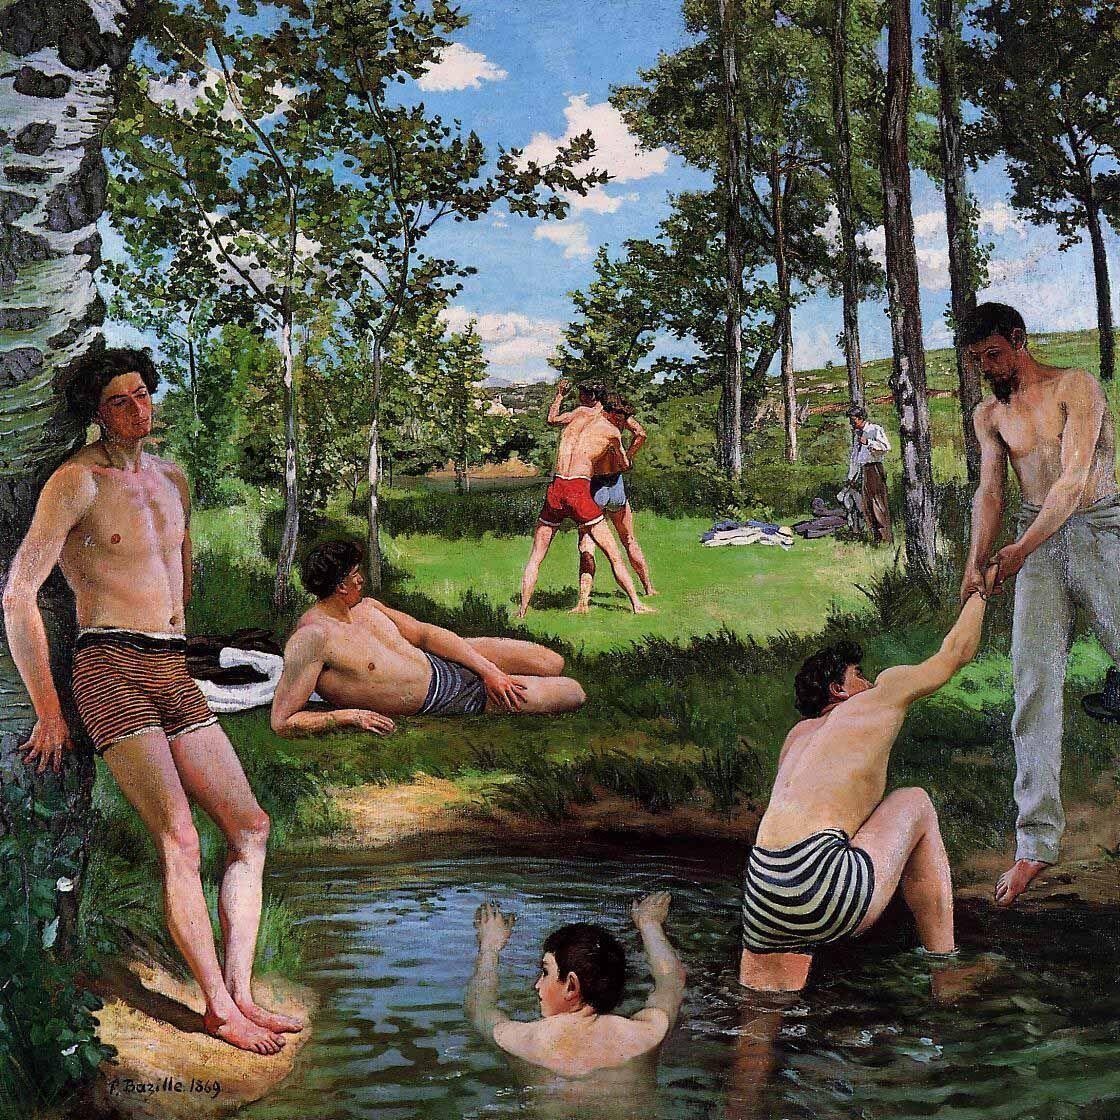 Frédéric Bazille, Summer Scene (Bathers), 1869. Fogg Museum. Photo via Wikimedia Commons.